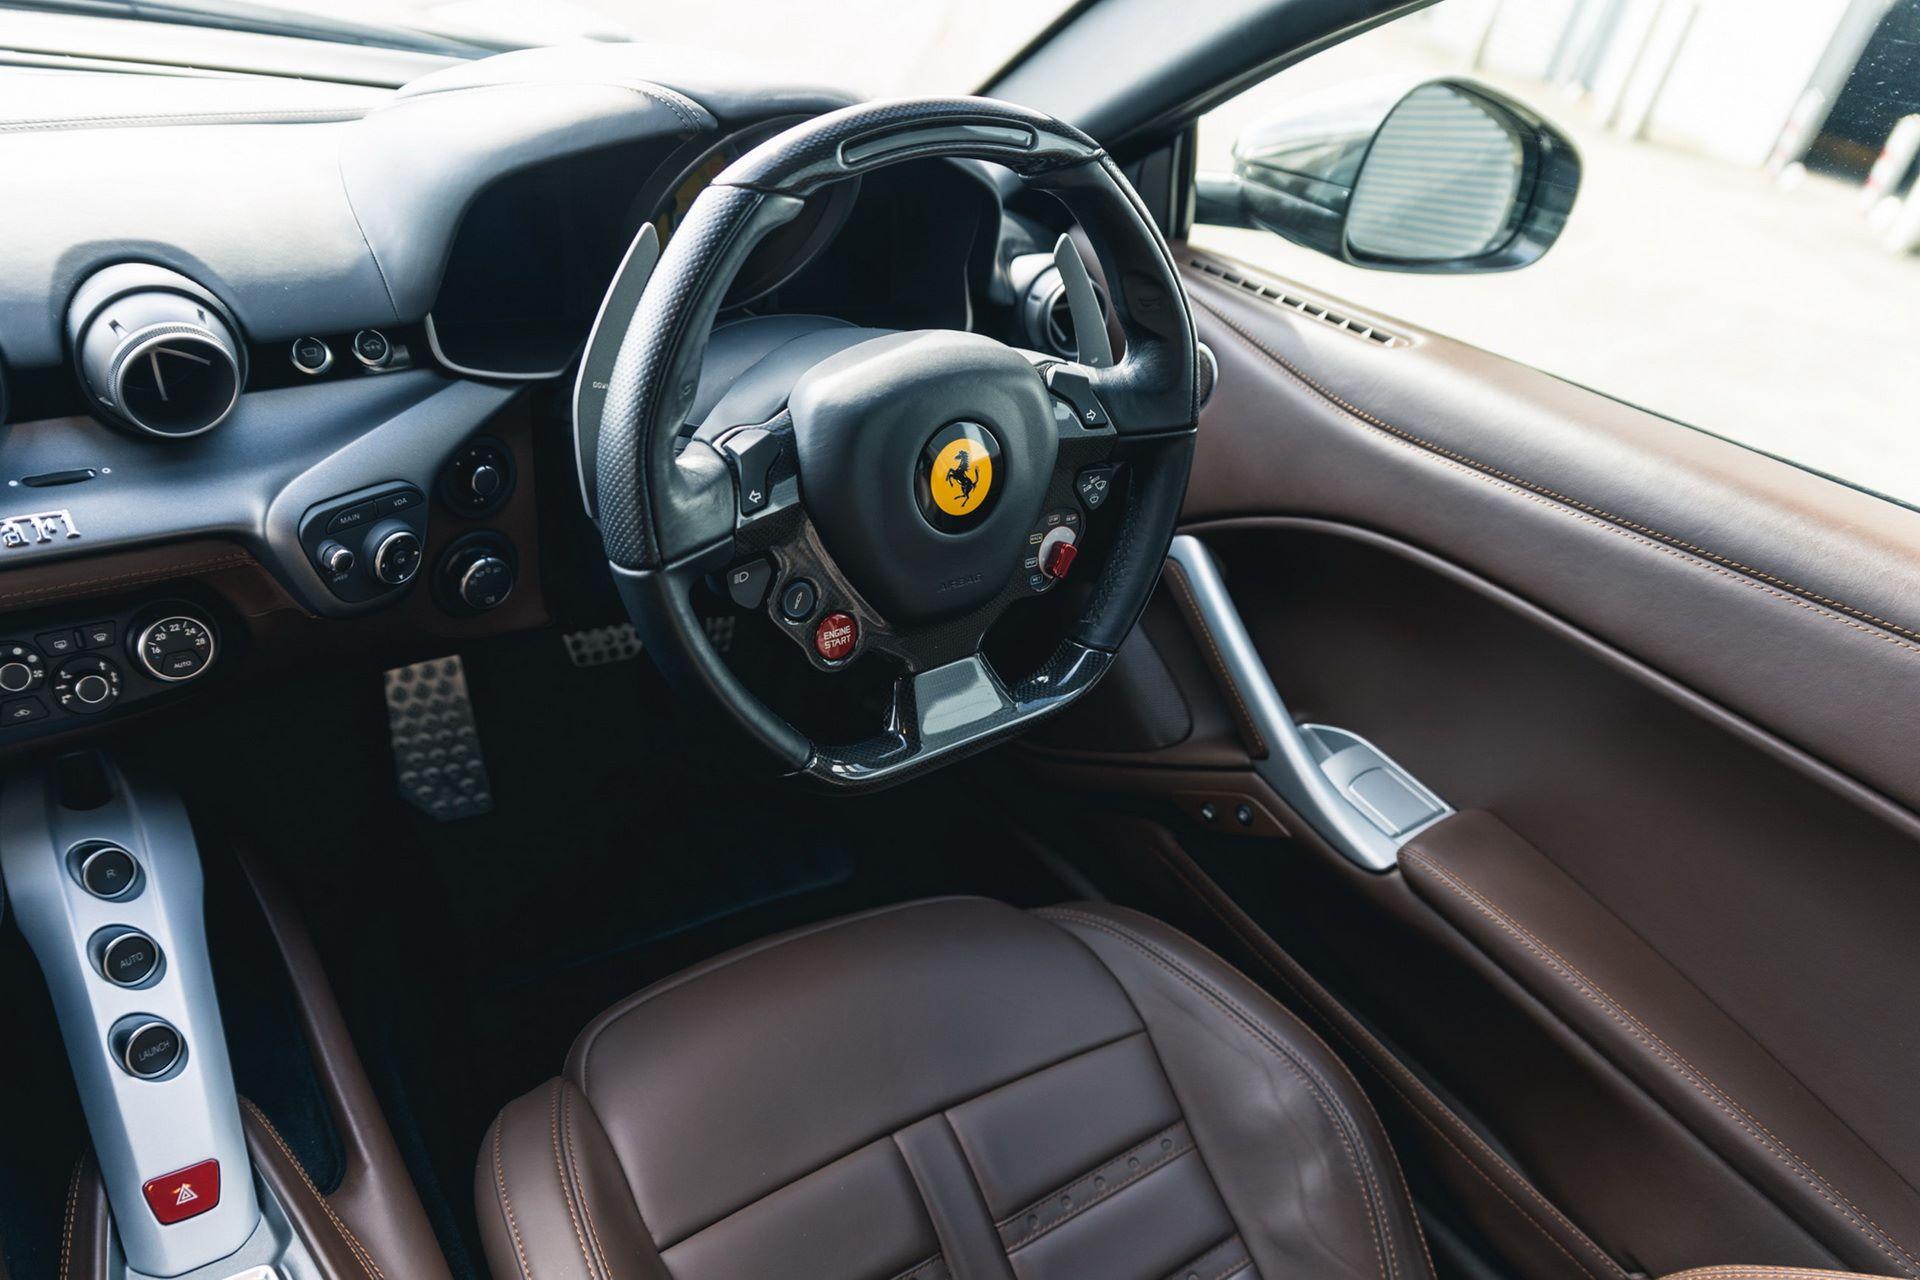 Ferrari-F12berlinetta-Chris-Harris-15